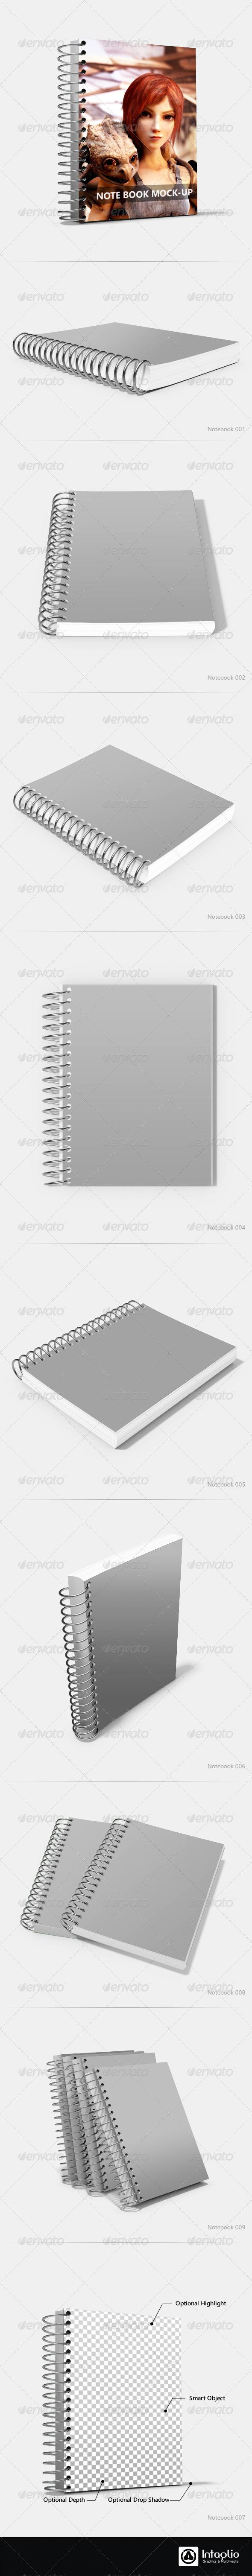 GraphicRiver Spiral Notebook Mock-Up 2418400